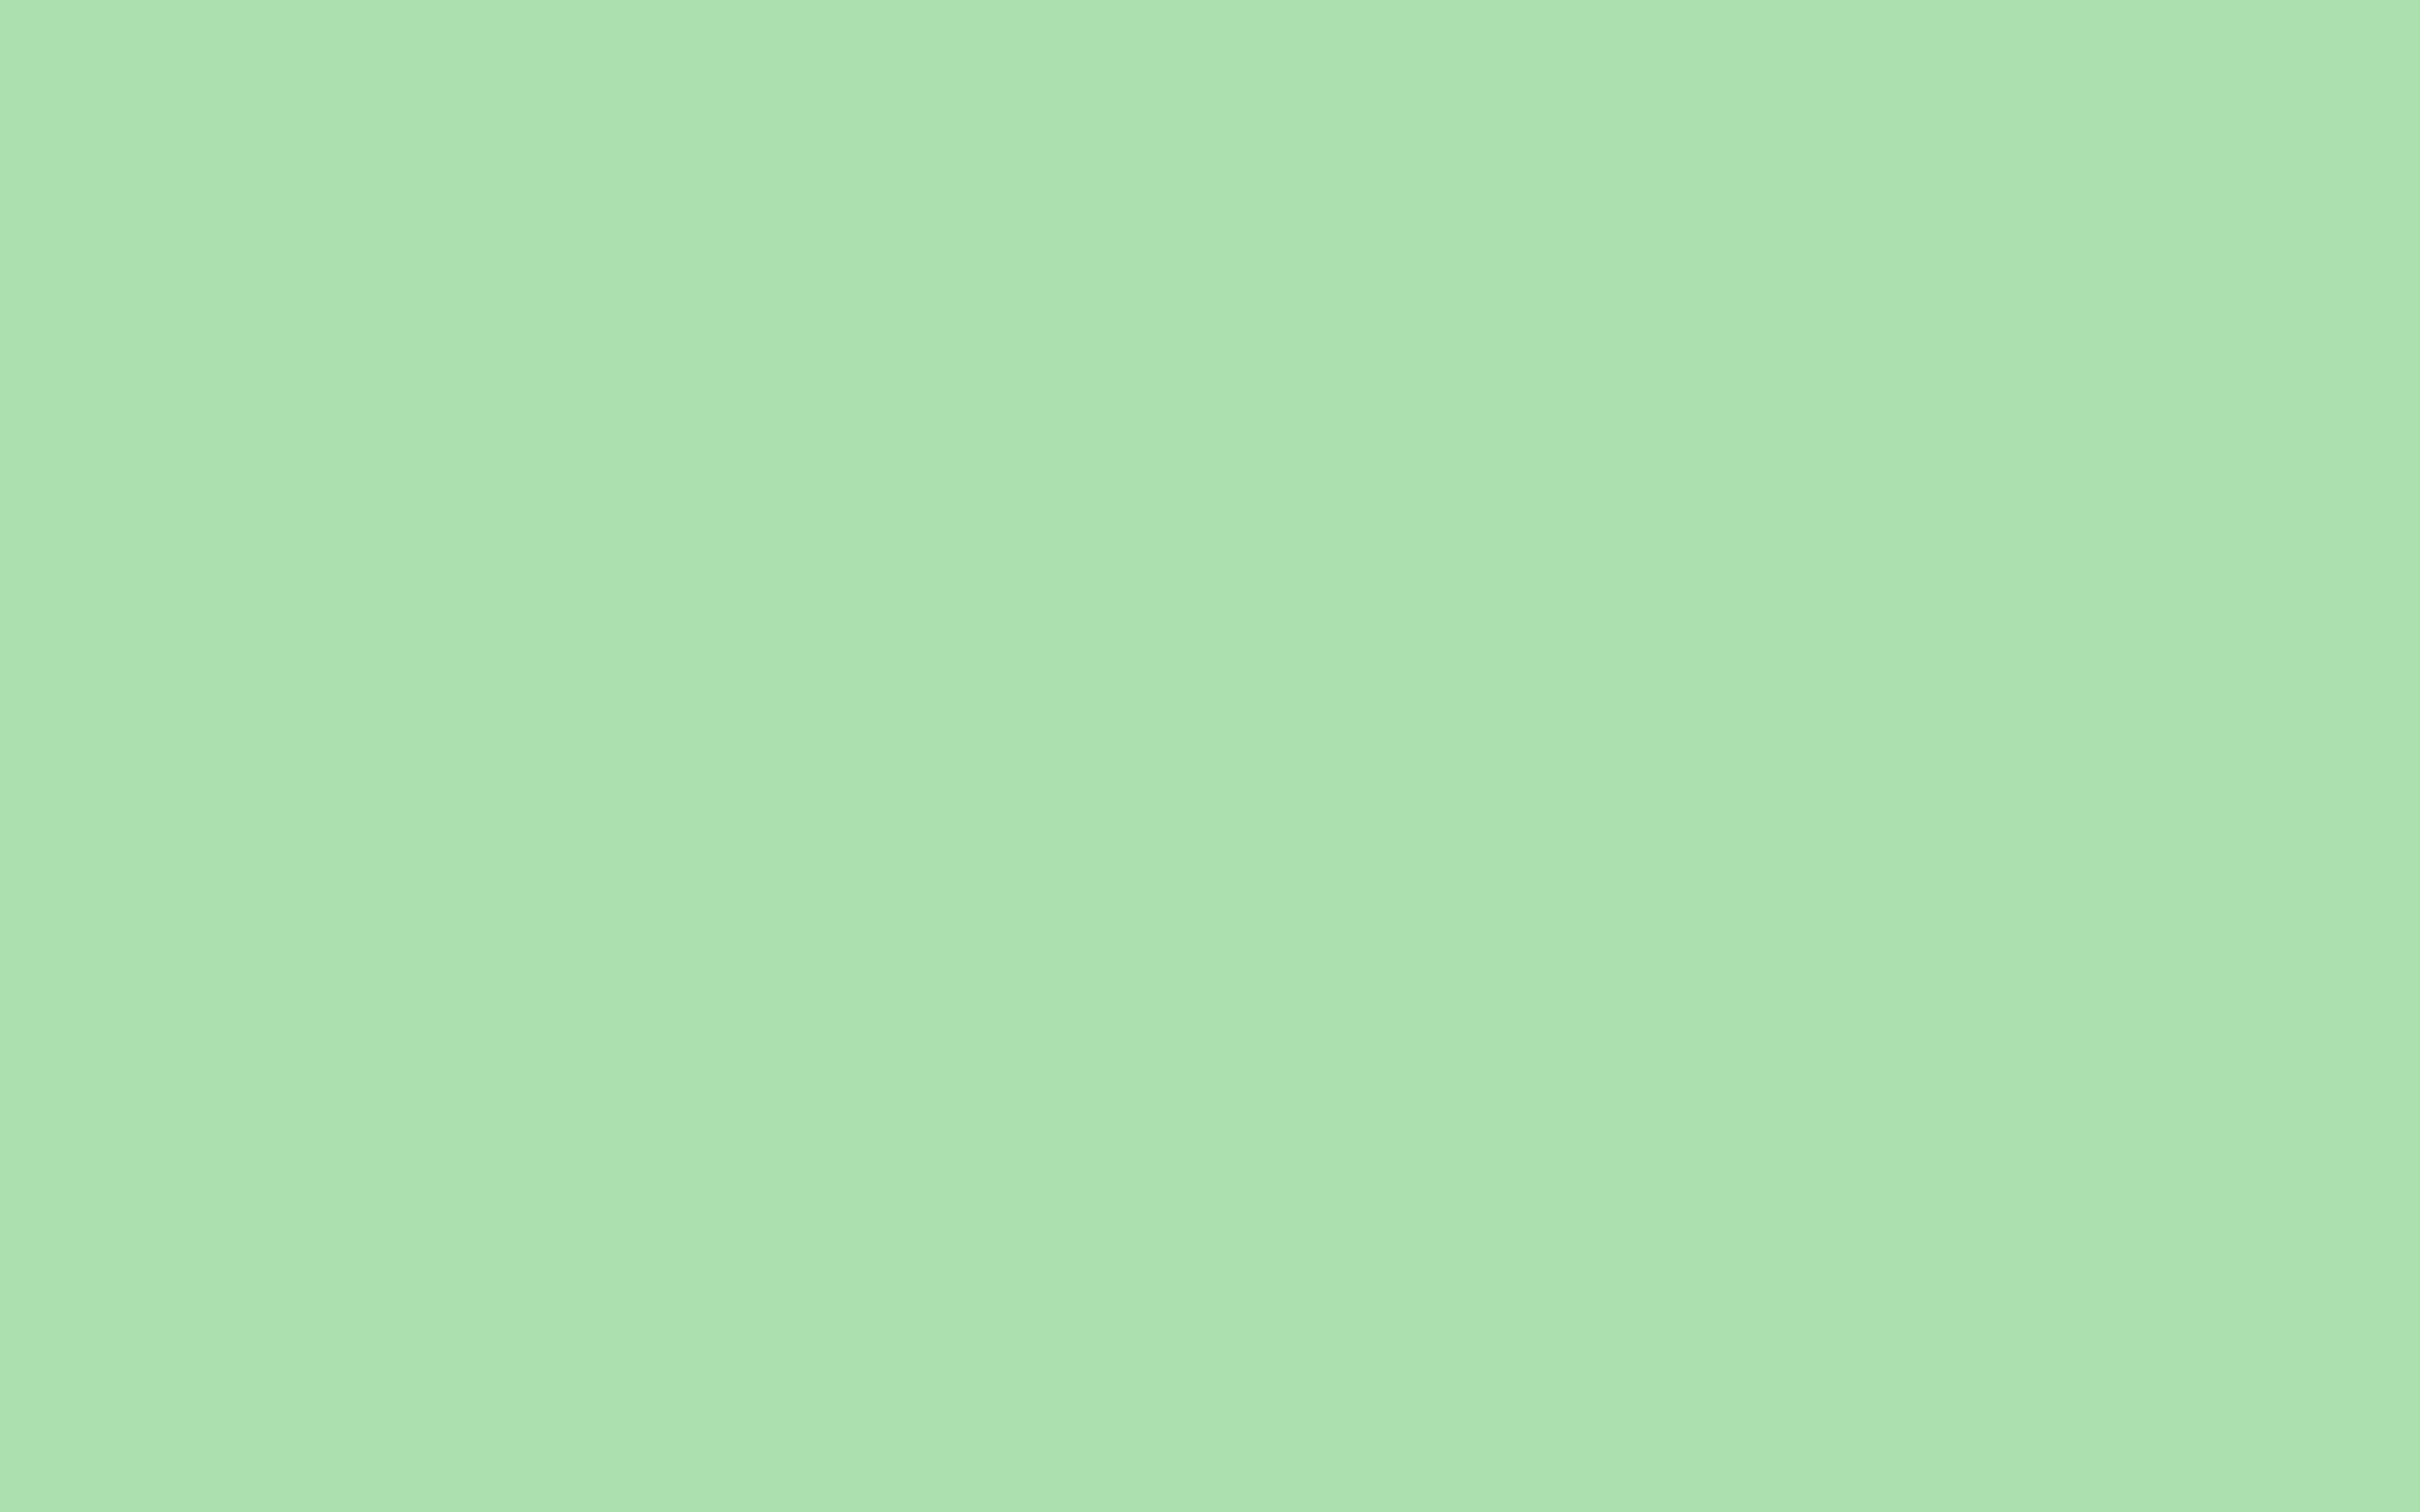 2560x1600 Celadon Solid Color Background